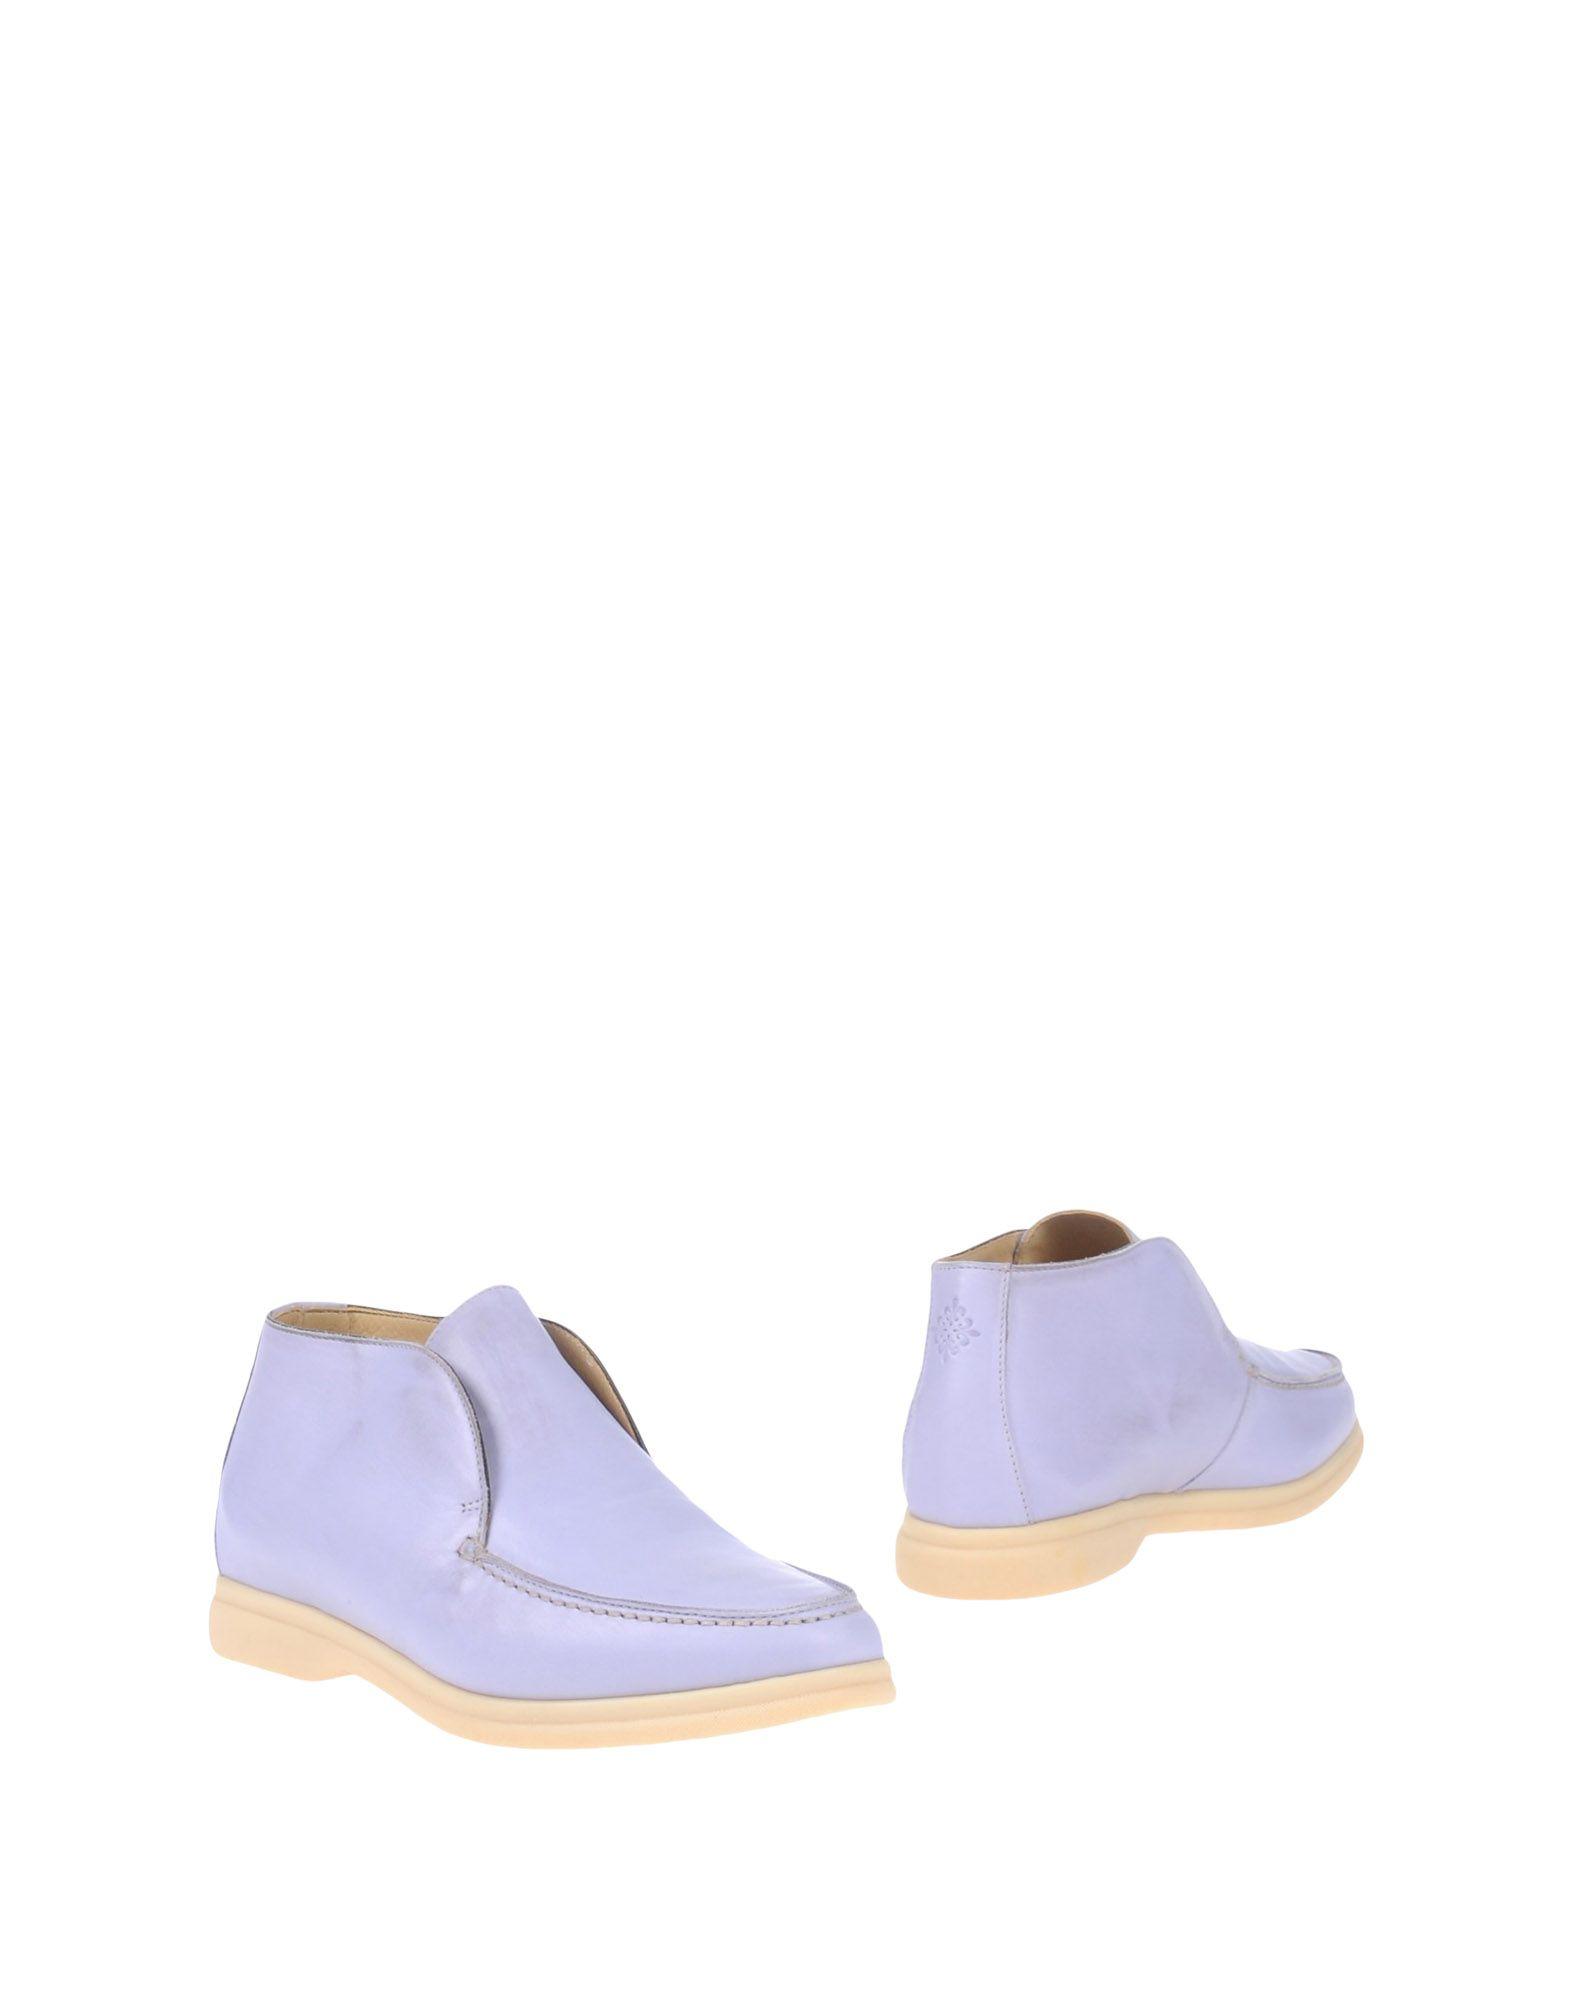 Gut um billige Schuhe zu tragenAndrea Ventura Firenze Stiefelette Damen  11441799XE